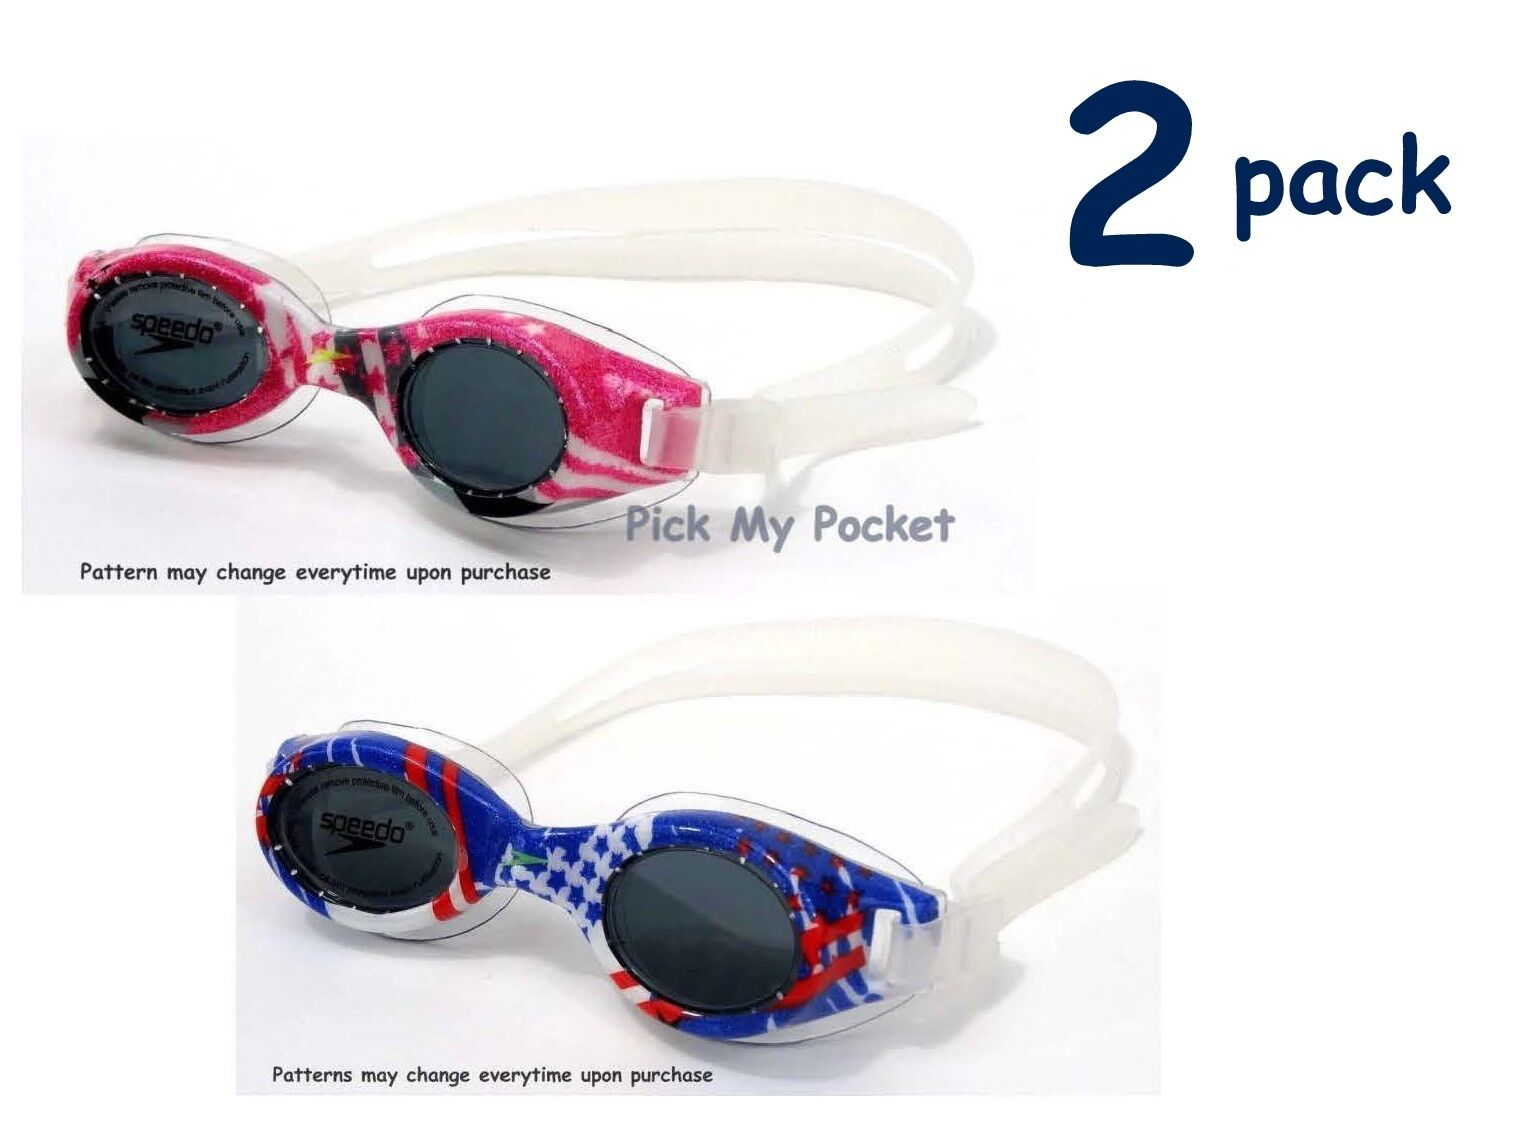 Speedo Junior Hydrospex Swim Goggle Vibrant PINK / BLUE - 2